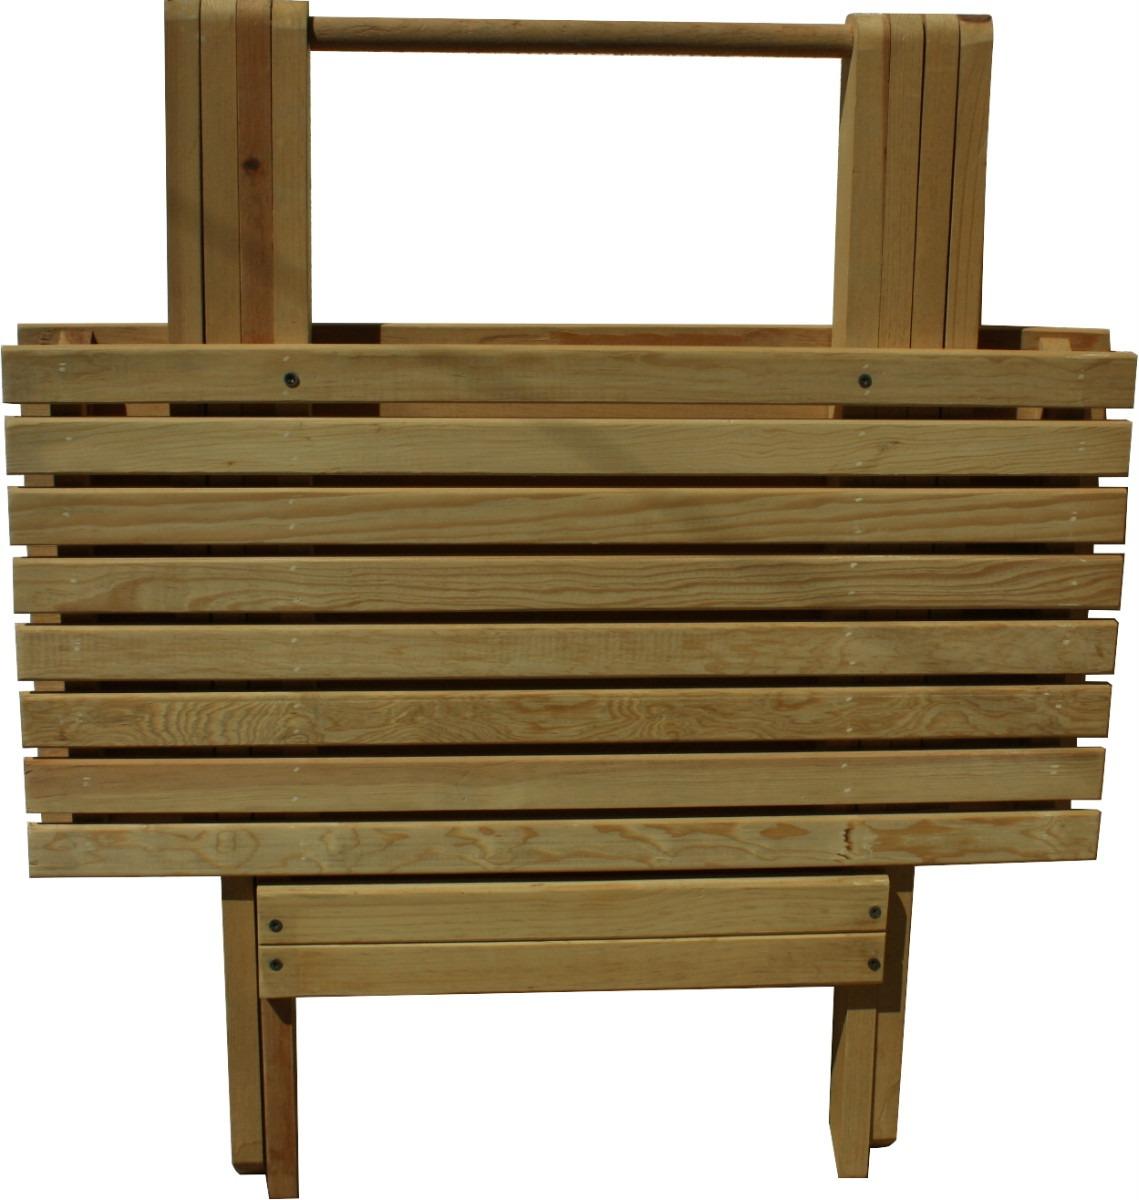 Mesas plegables madera muebles de madera para jardin - Muebles de jardin ...